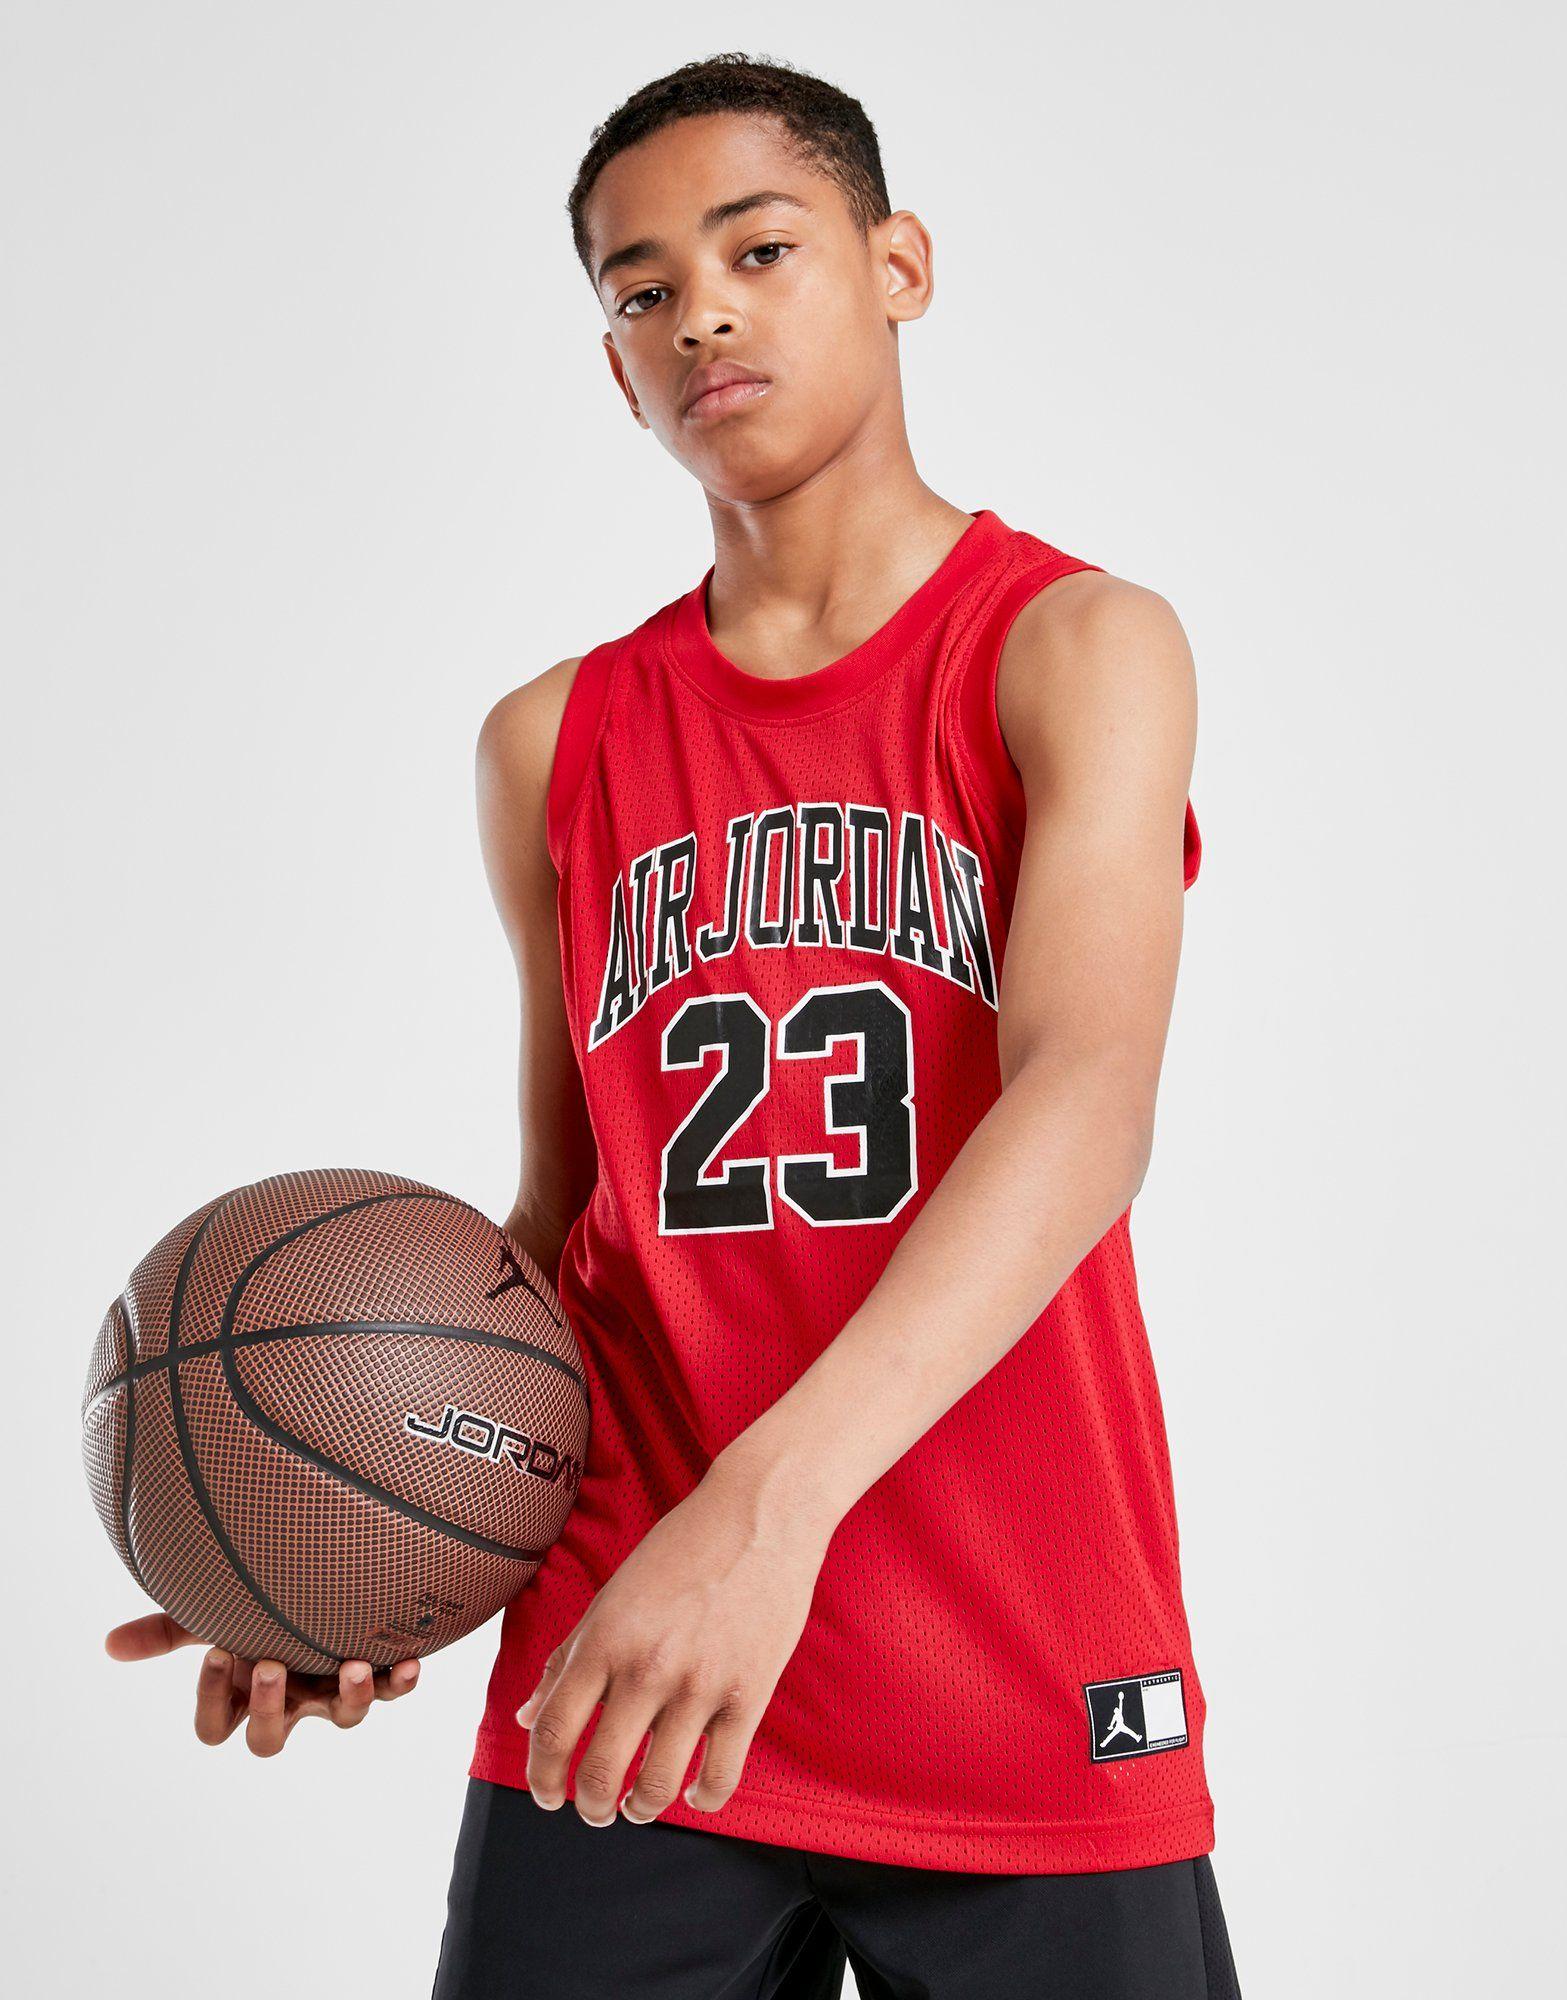 Jordan Mesh Jersey Junior